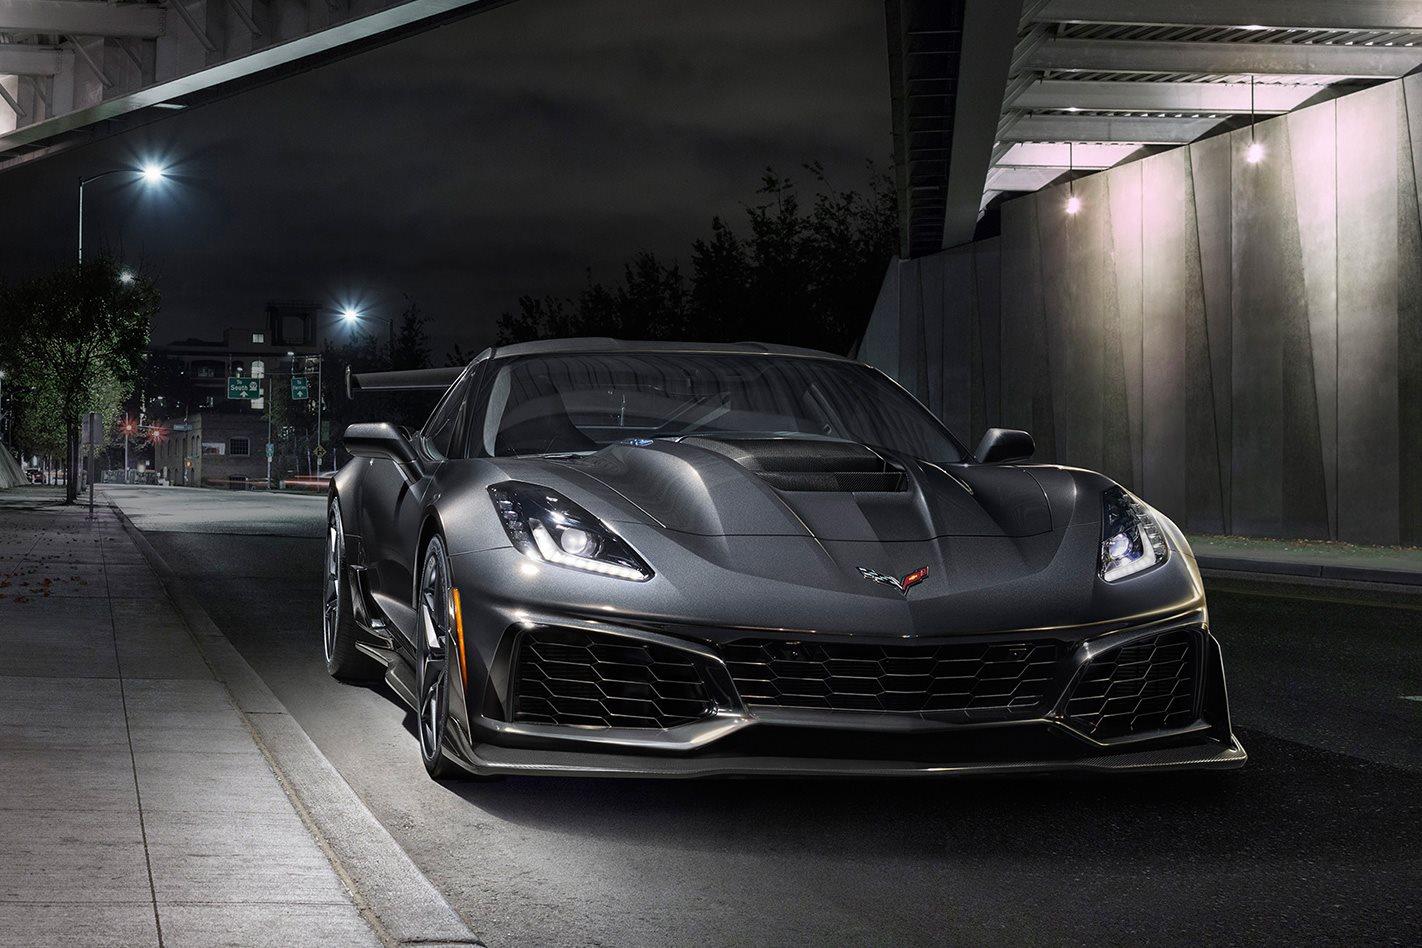 2019 Chevrolet Corvette ZR1 front